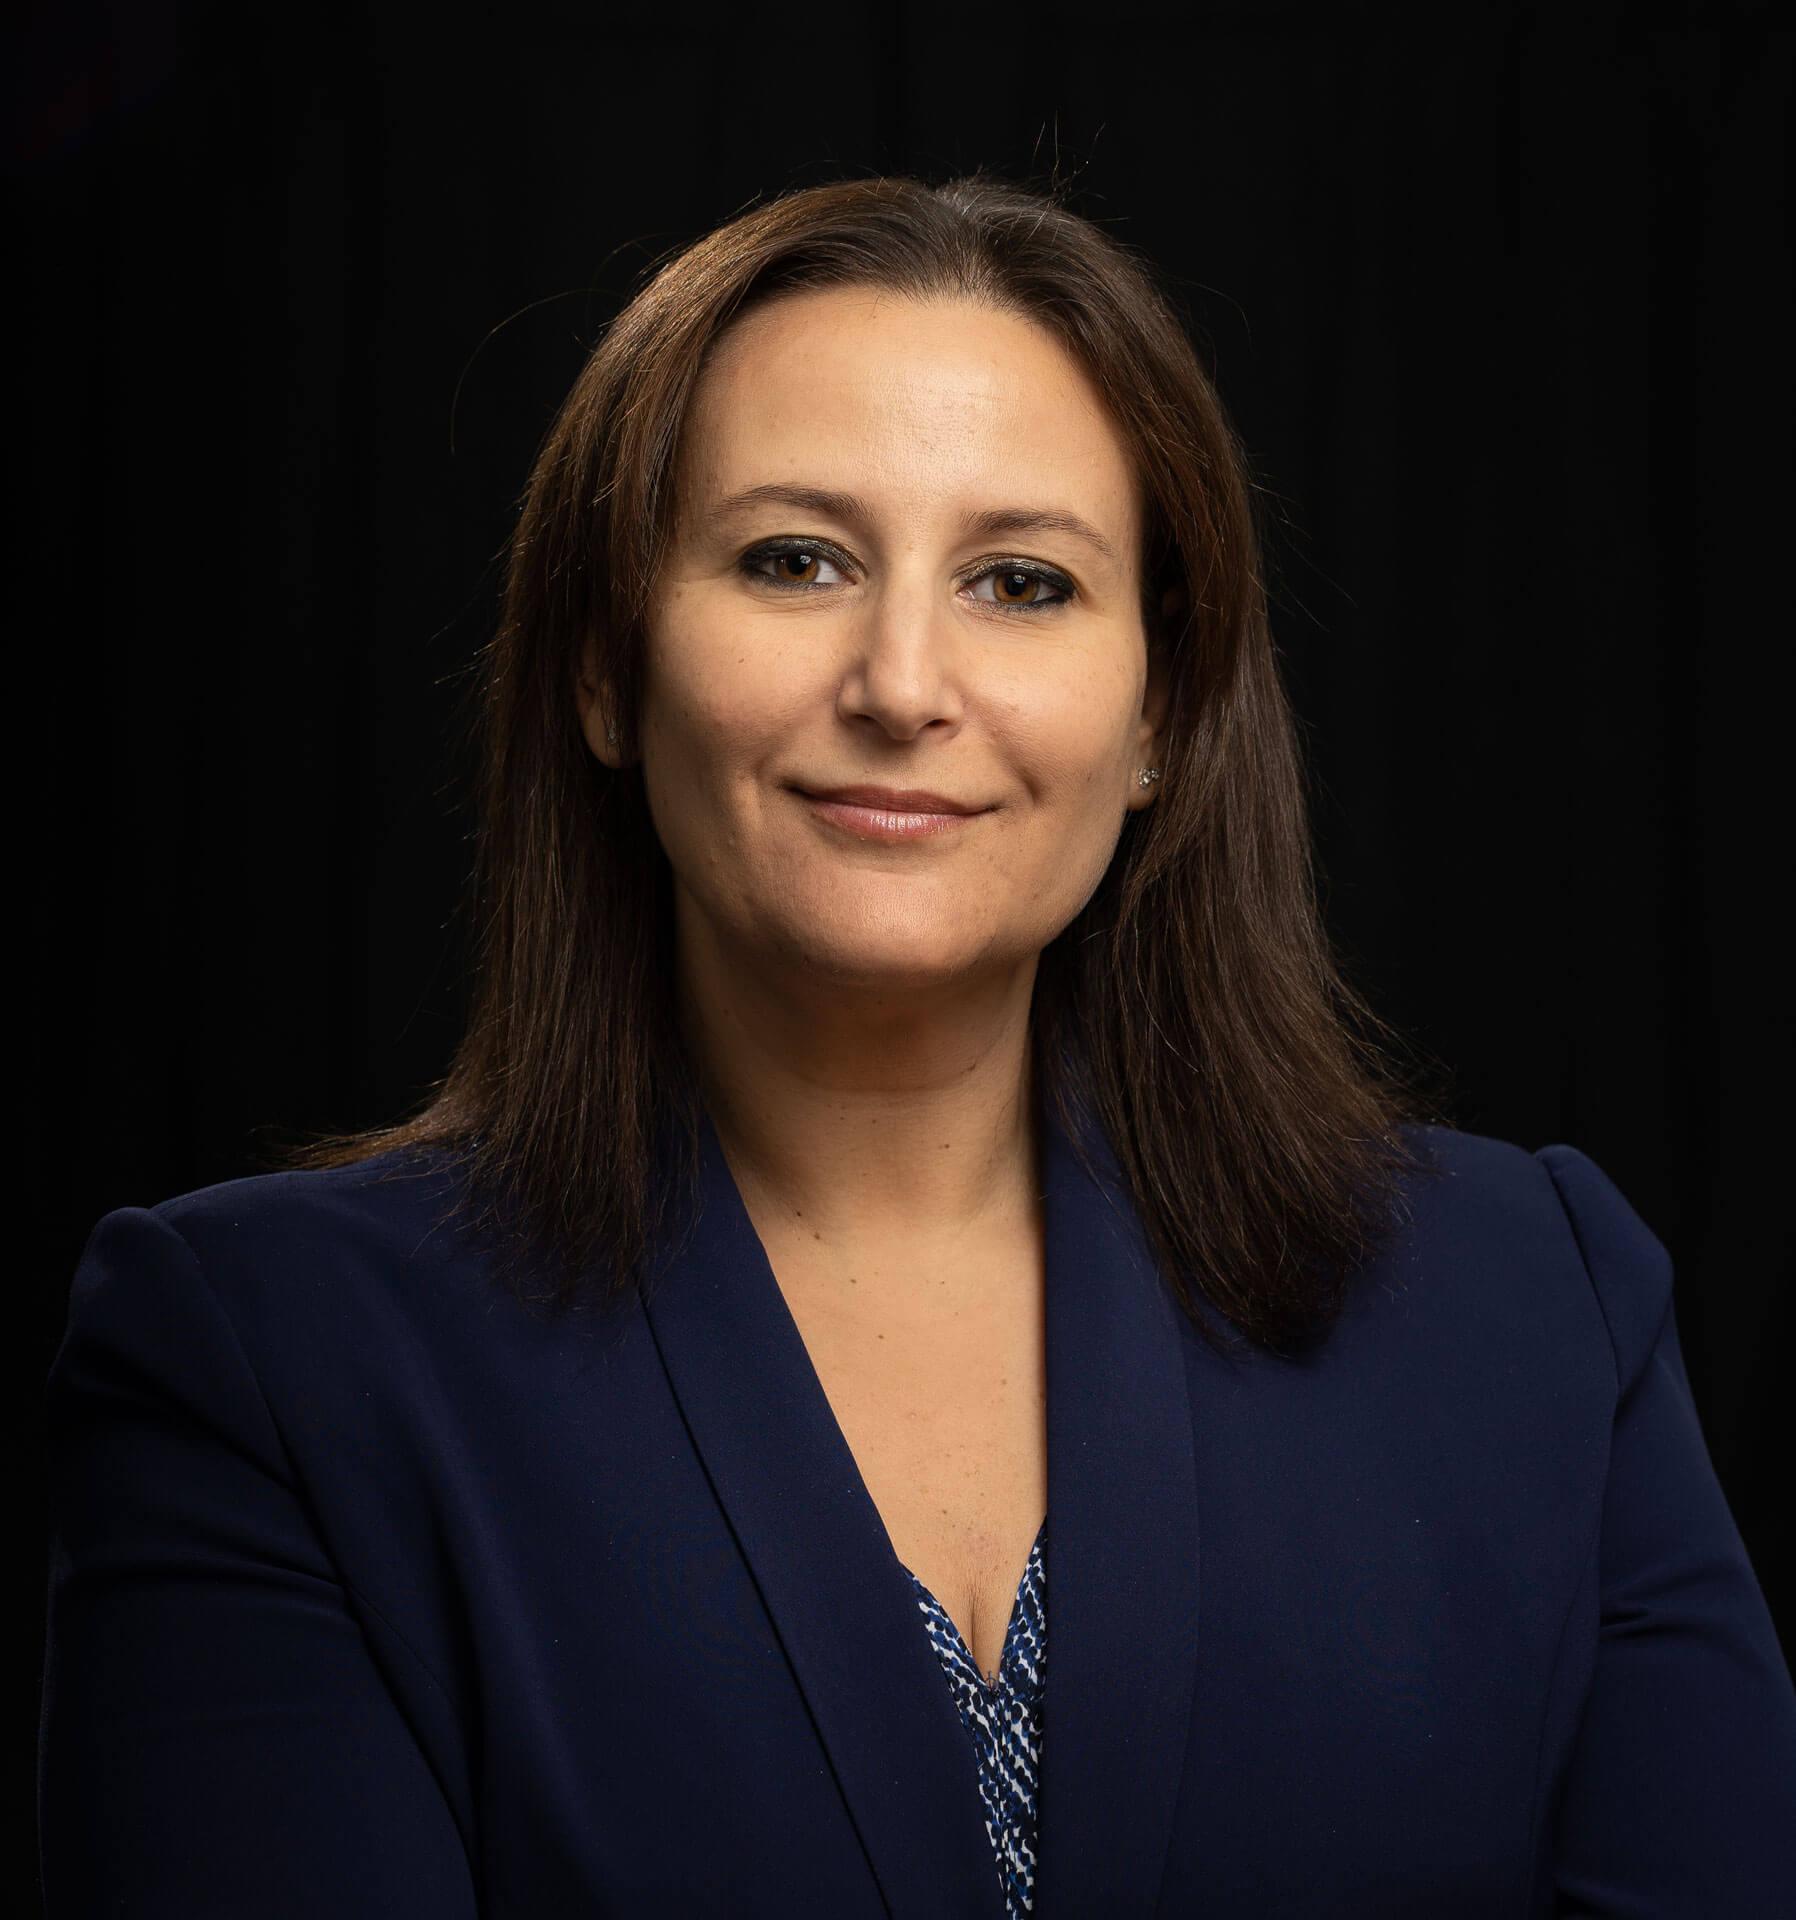 Natalie Greenberg